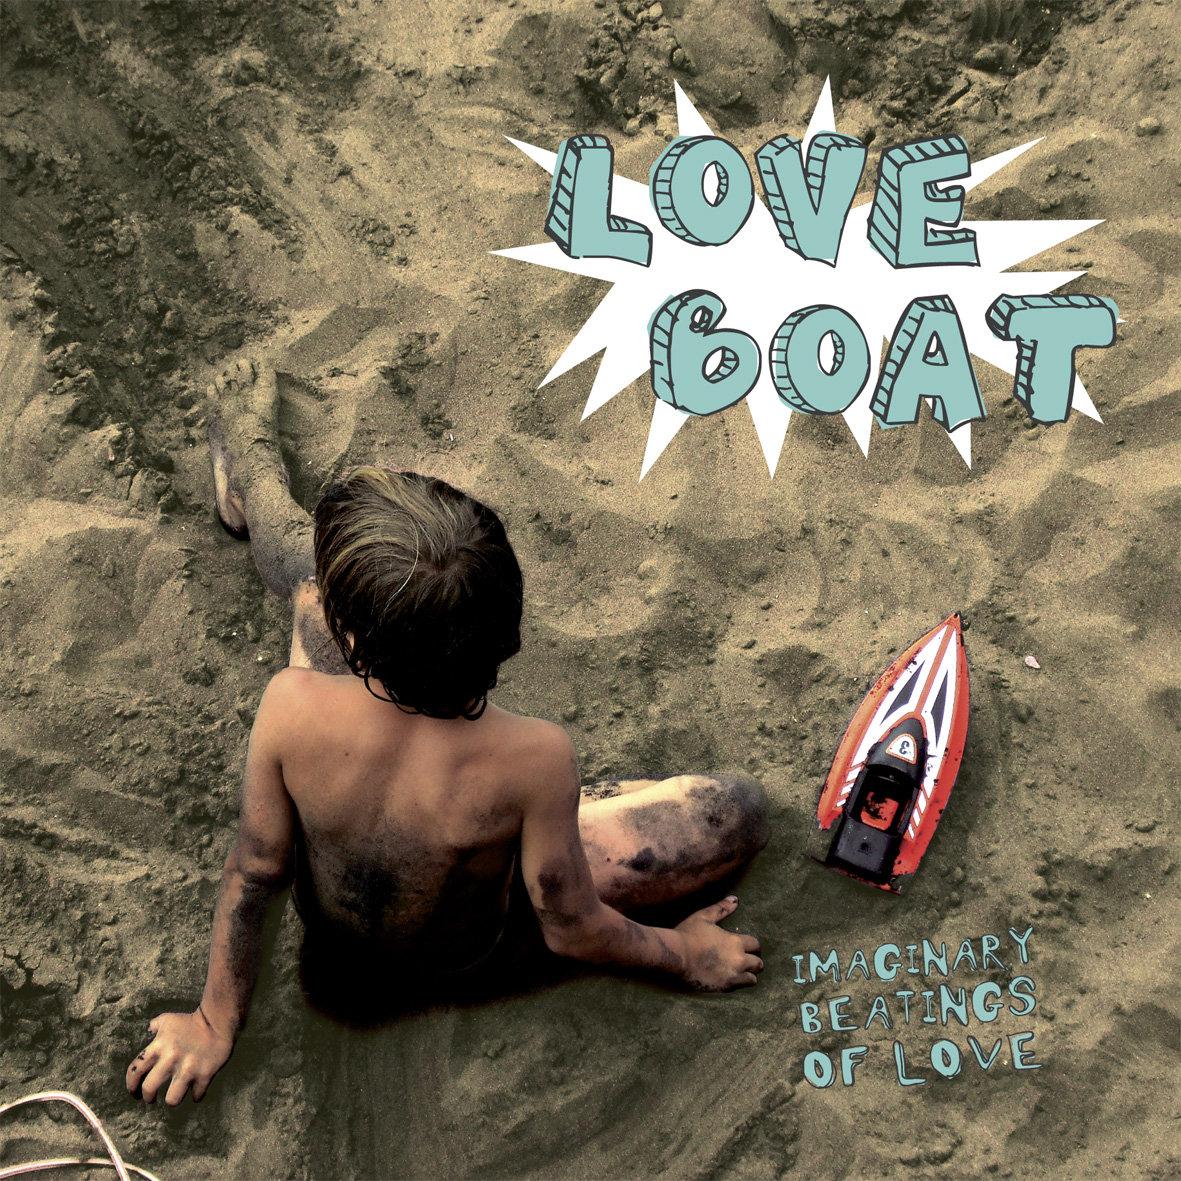 Love Boat Imaginary Beatings Of Love Alien Snatch